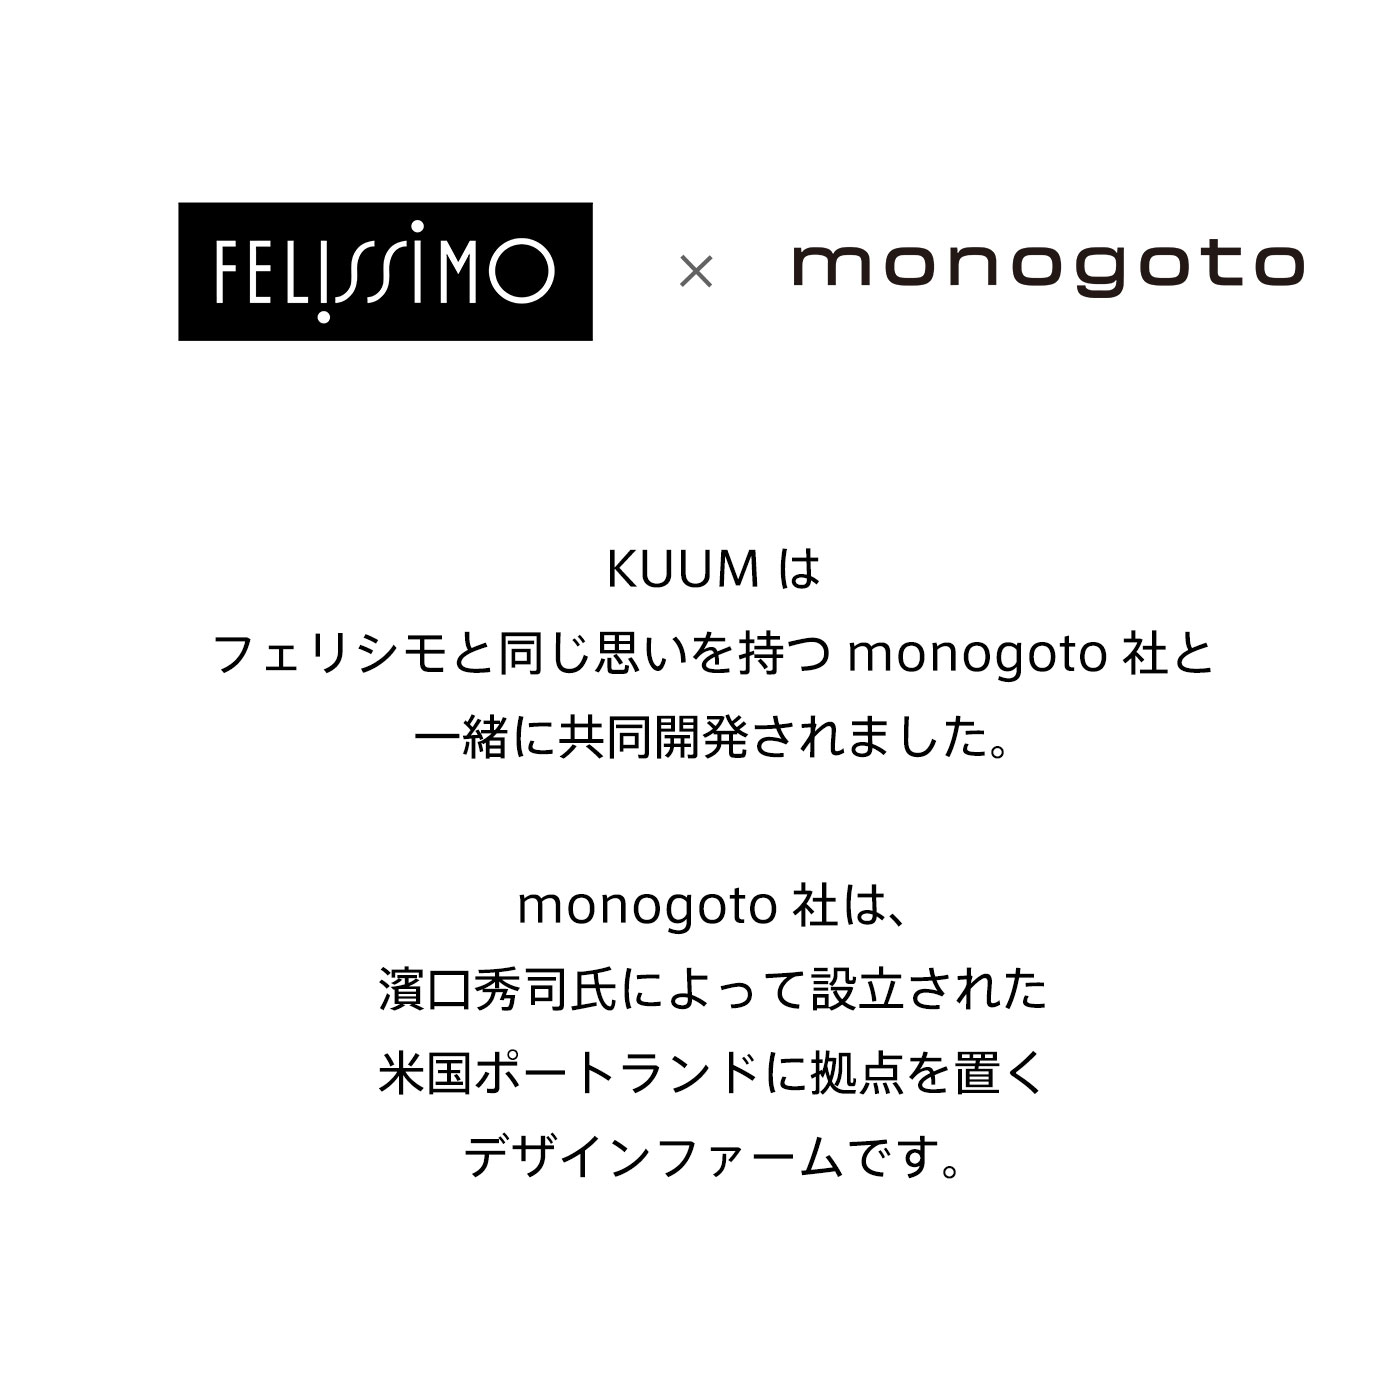 monogoto社(CEO:濱口秀司氏)と一緒に開発された積木です。